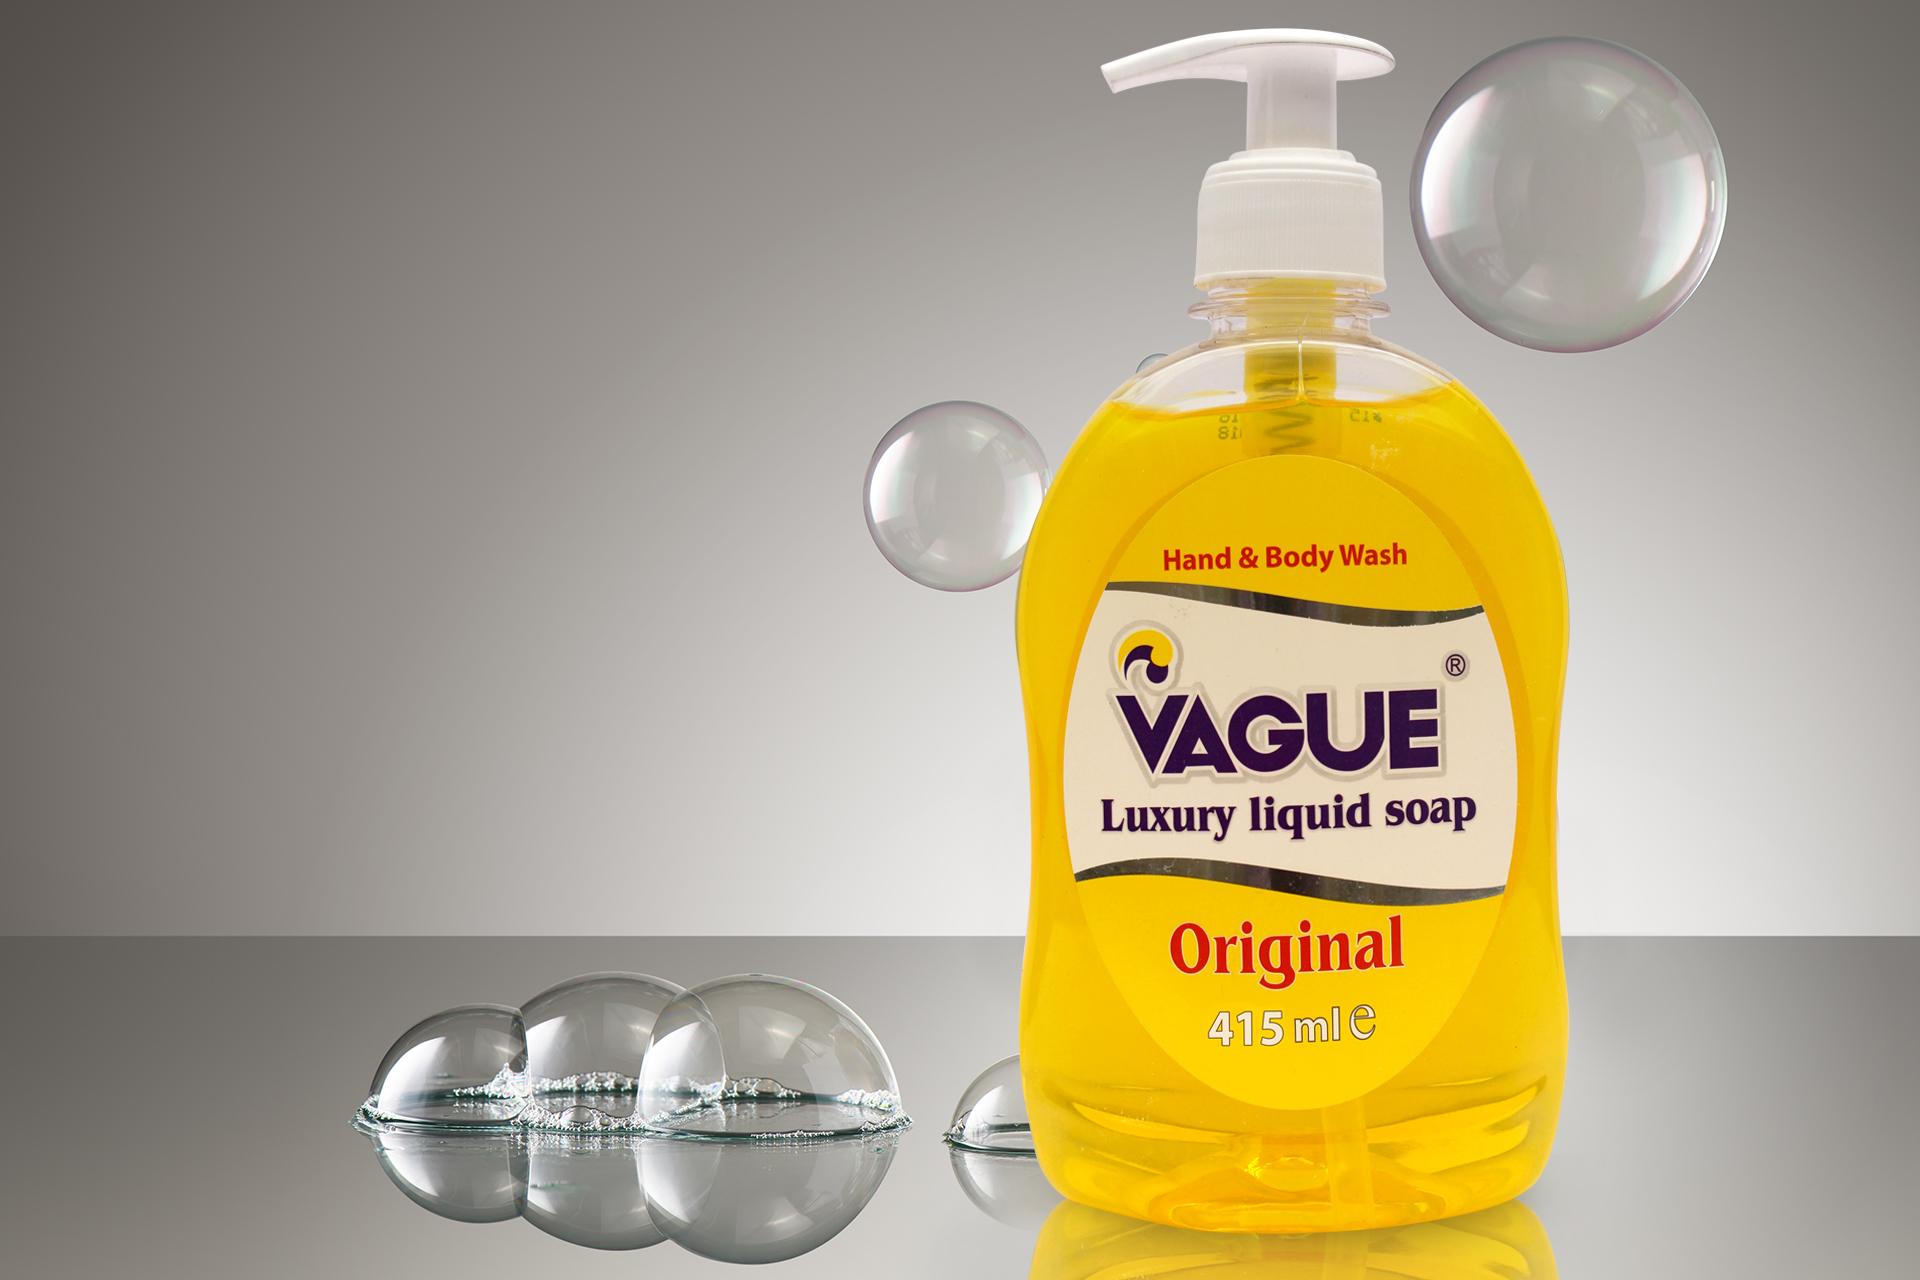 https://www.orbitsarl.com/wp-content/uploads/2017/09/Product-Toiletries_VagueLiquid-Soap_Original-415ml_1920x1280-FIN.jpg